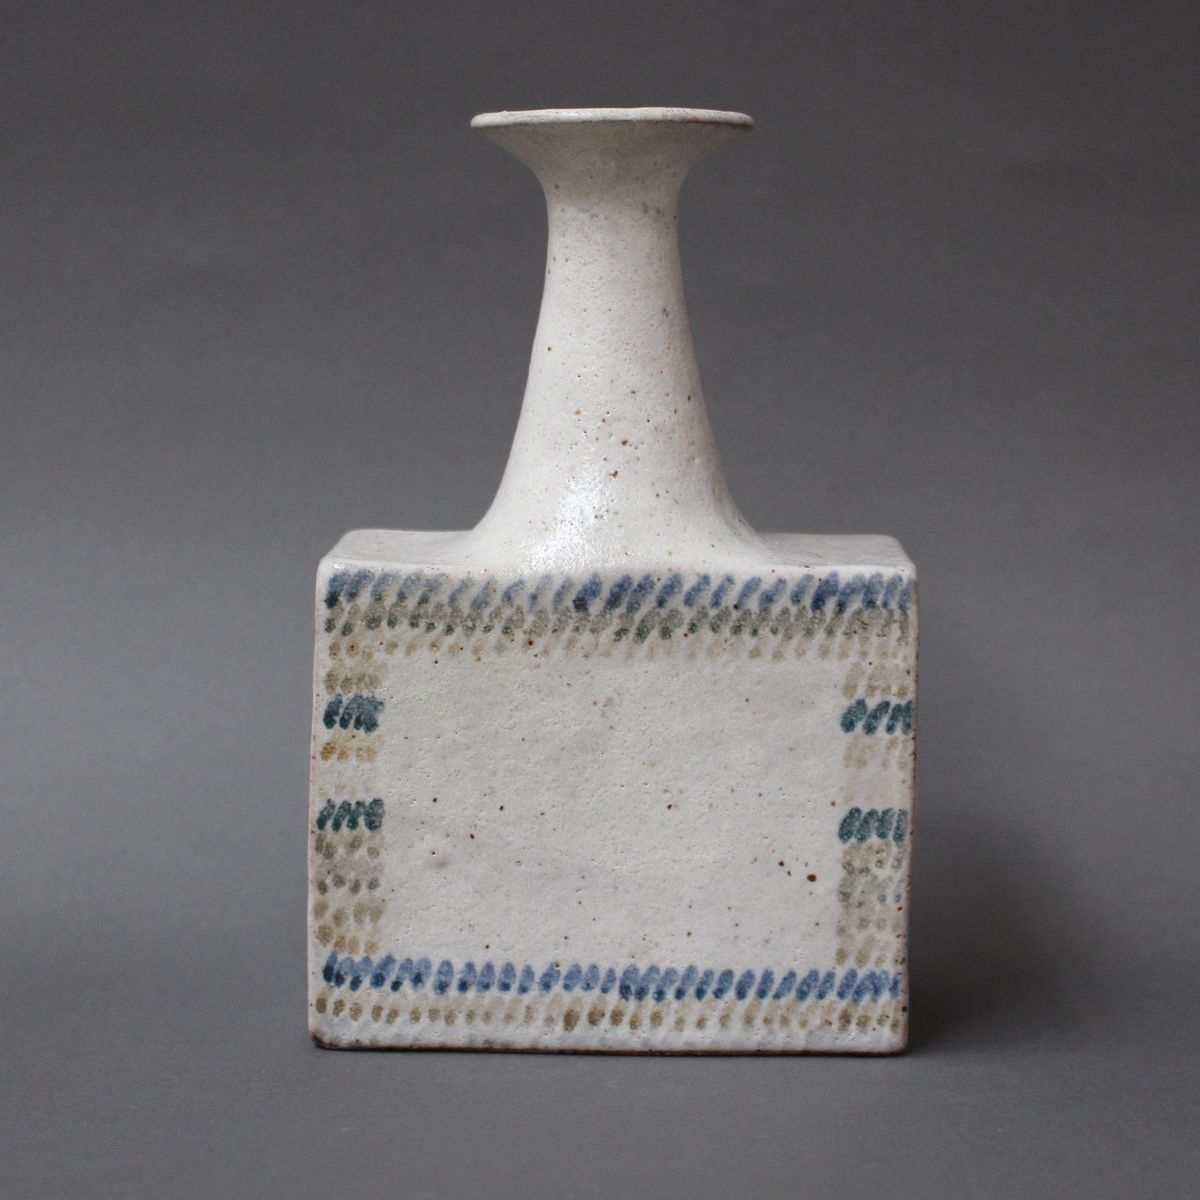 Vintage ceramic vase with geometric line design by bruno gambone vintage ceramic vase with geometric line design by bruno gambone reviewsmspy